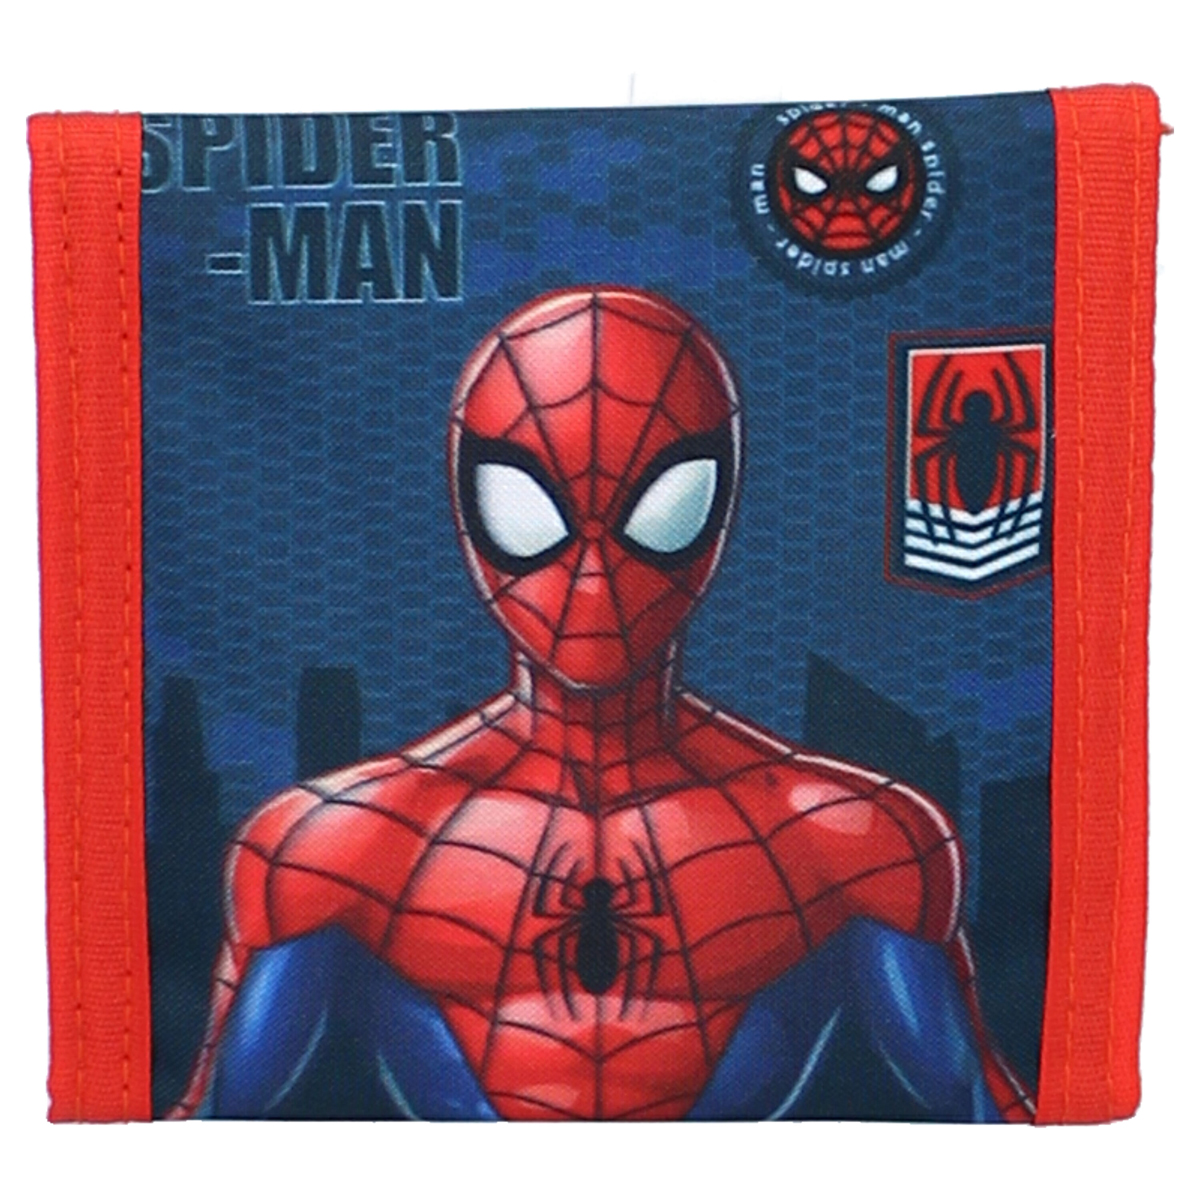 Portefeuille scratch \'Spiderman\' bleu rouge - 10x10 cm - [A3031]